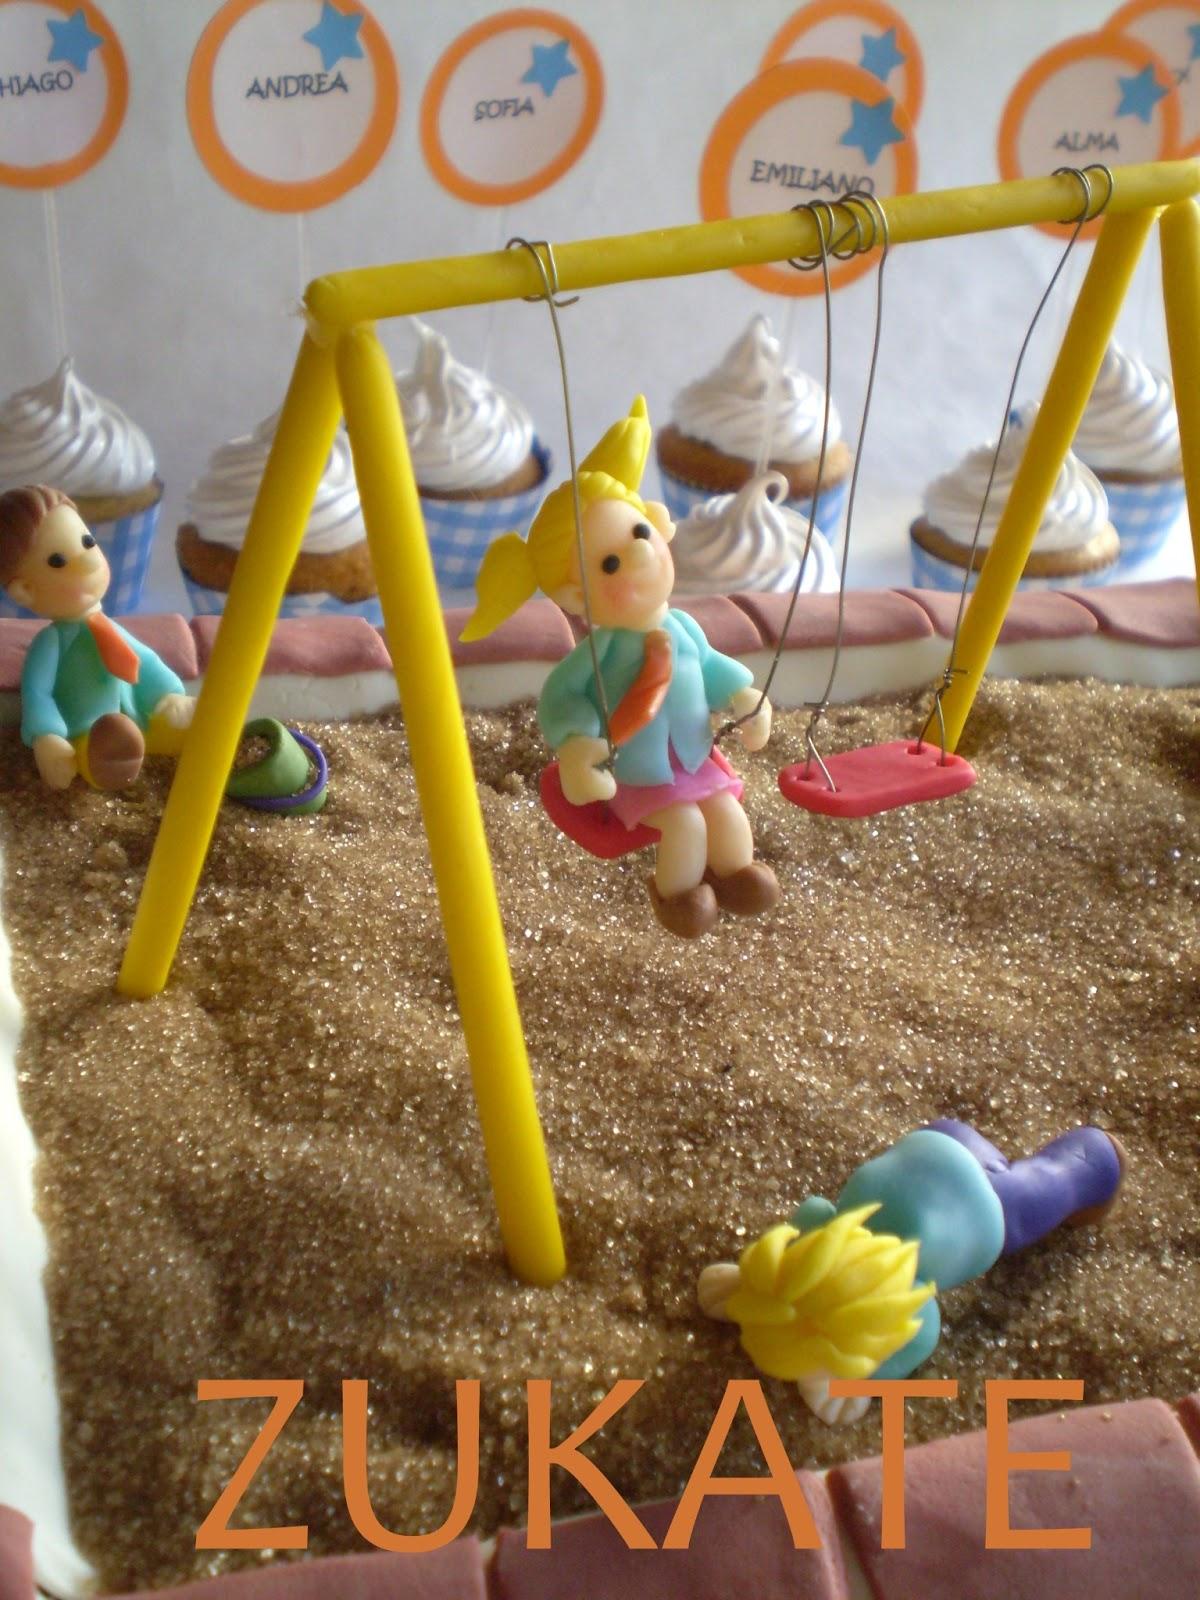 Torta egresaditos jardin de infantes zukate for Azul naranja jardin de infantes